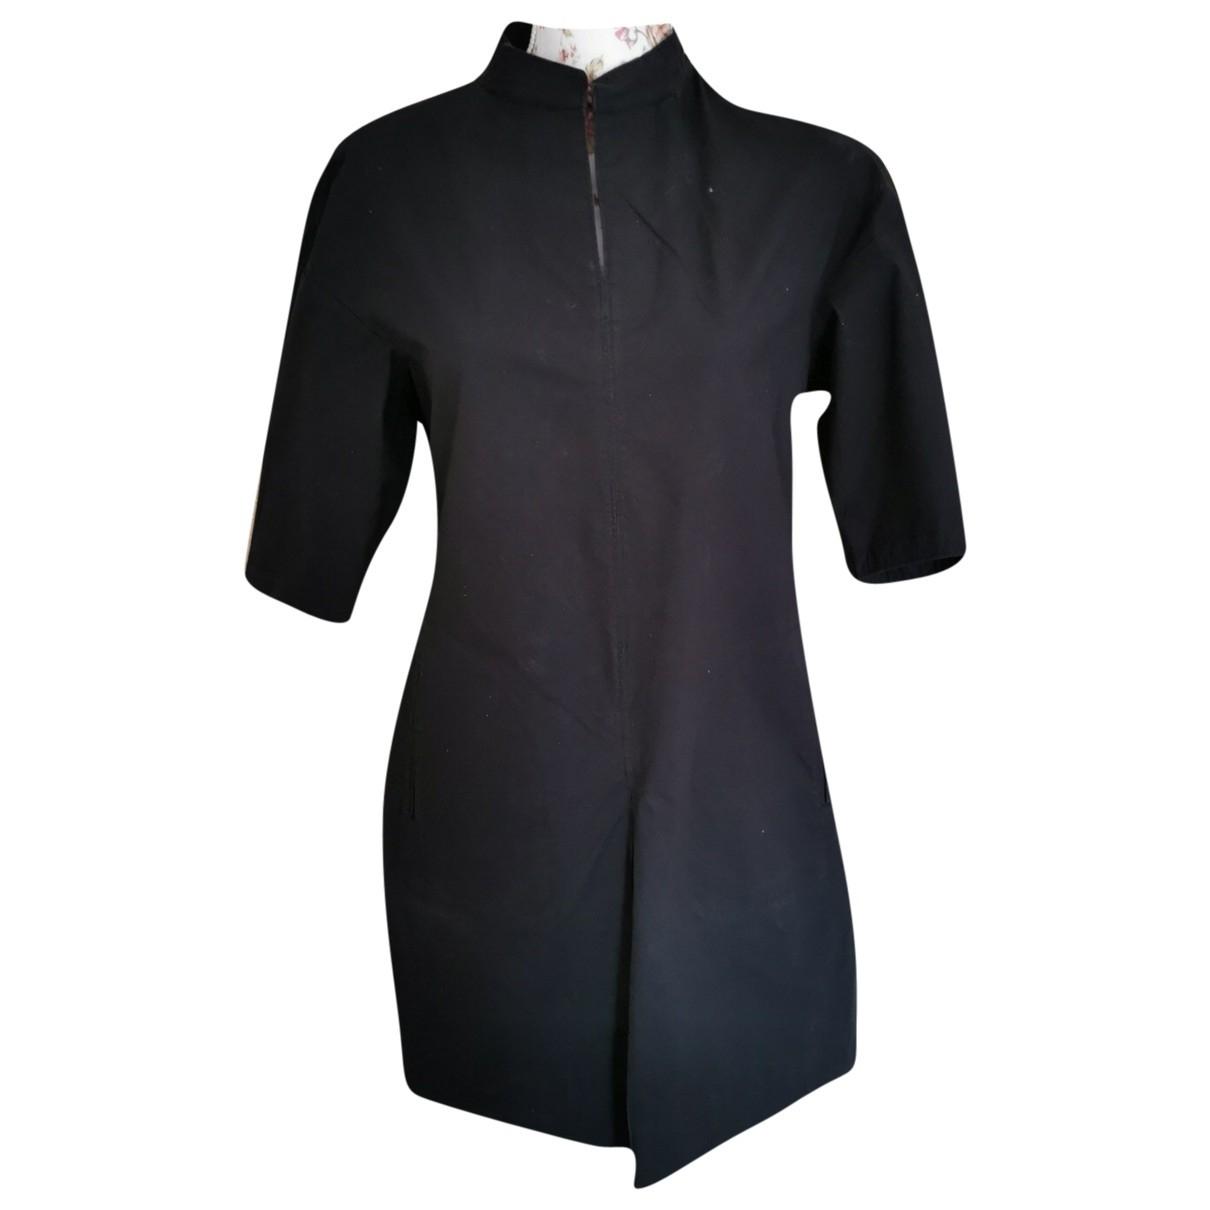 Uniqlo \N Black Cotton dress for Women M International